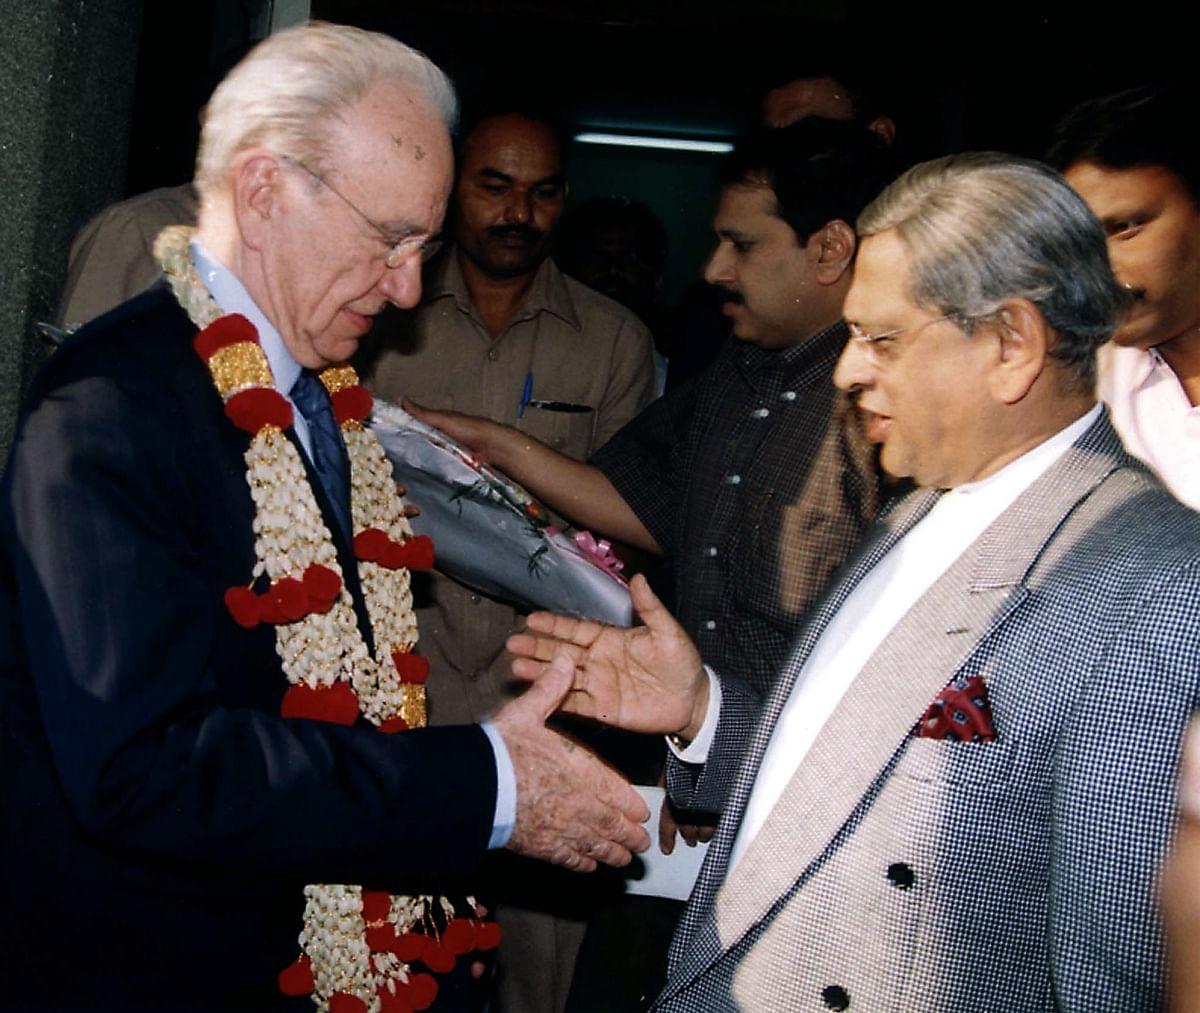 Rupert Murdoch (left) shakes hands with SM Krishna, former Chief Minister  of Karnataka, in 2000.